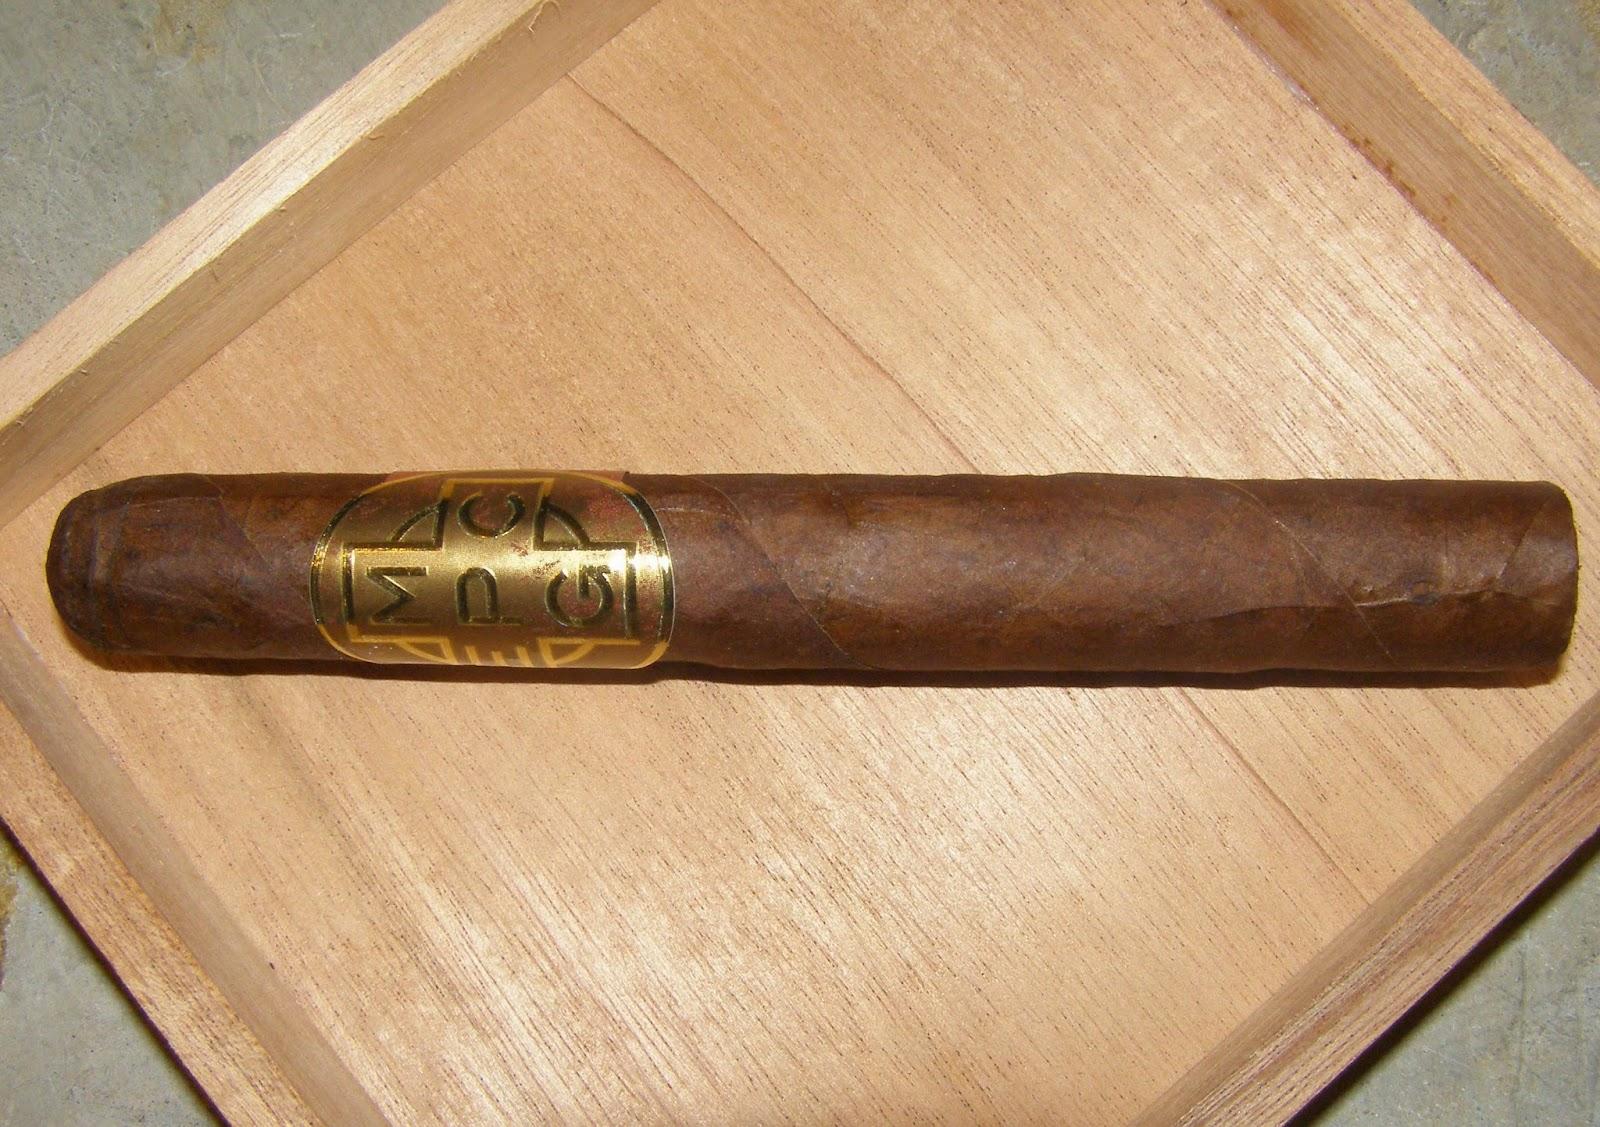 Cigar Review: E.P. Carrillo Re+United